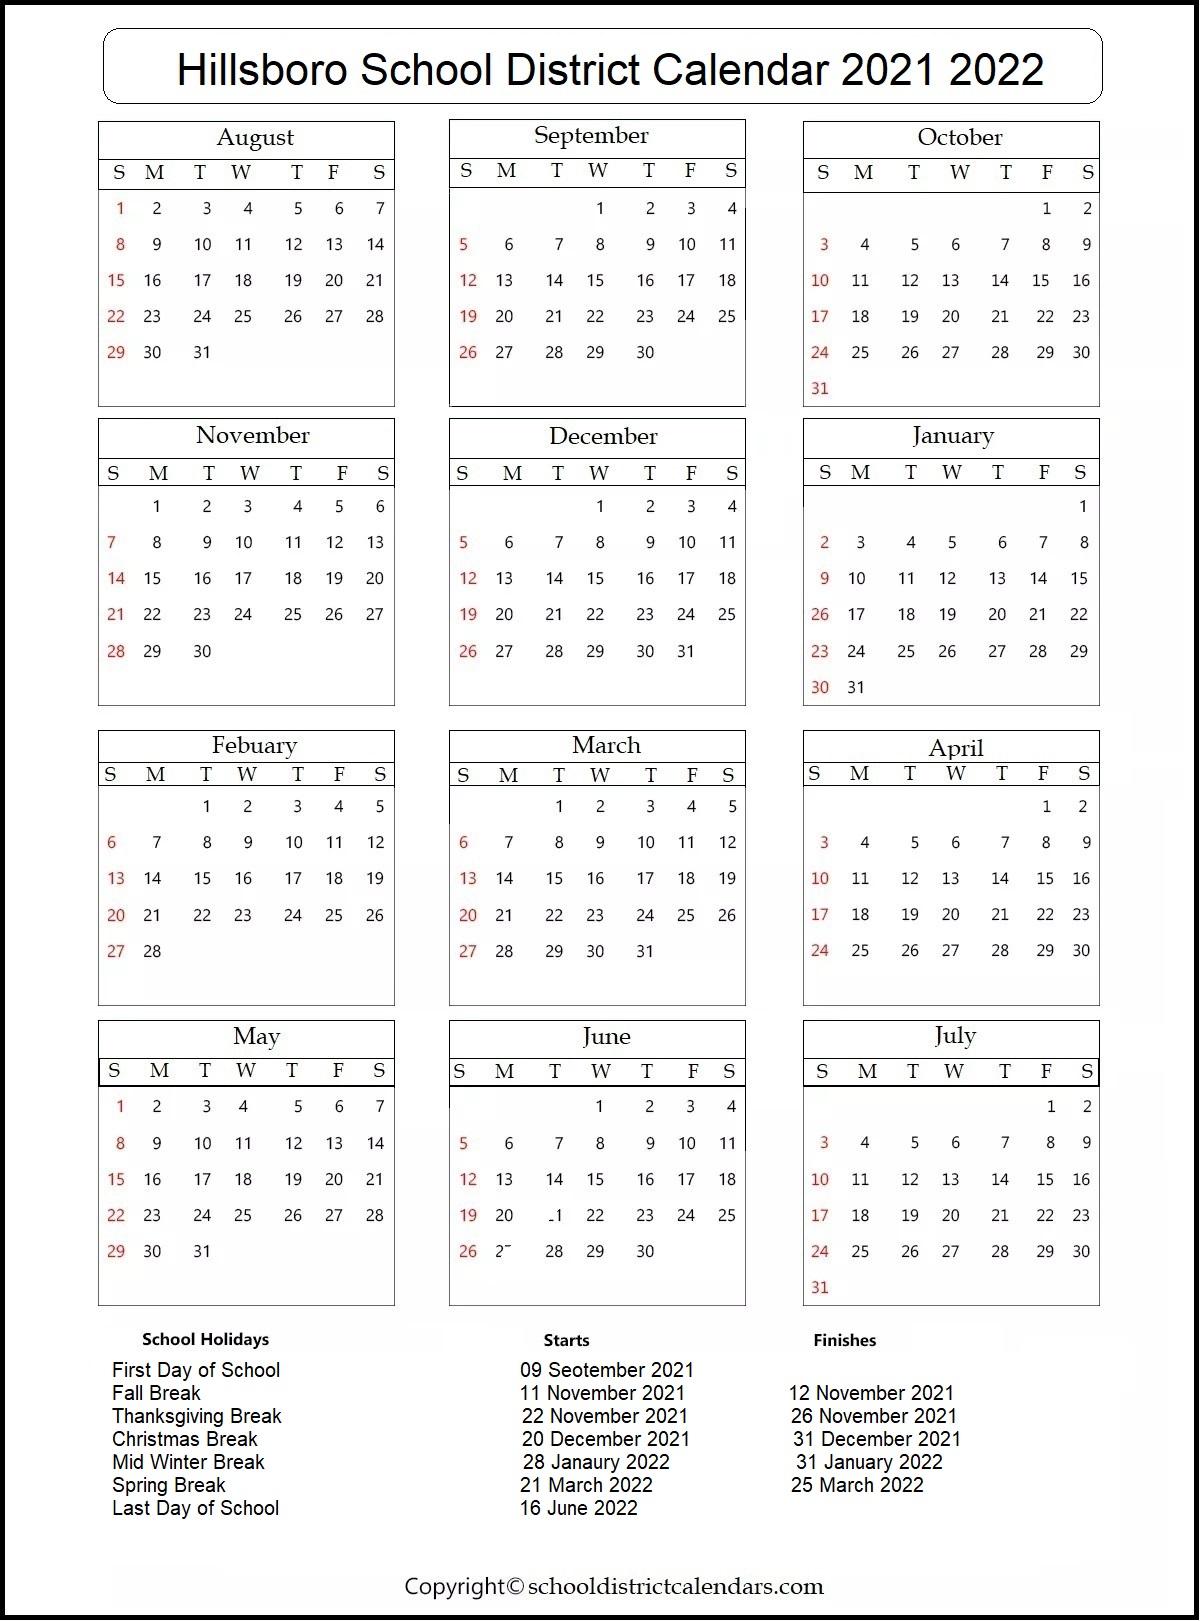 Hillsboro School District Calendar 2021 2022